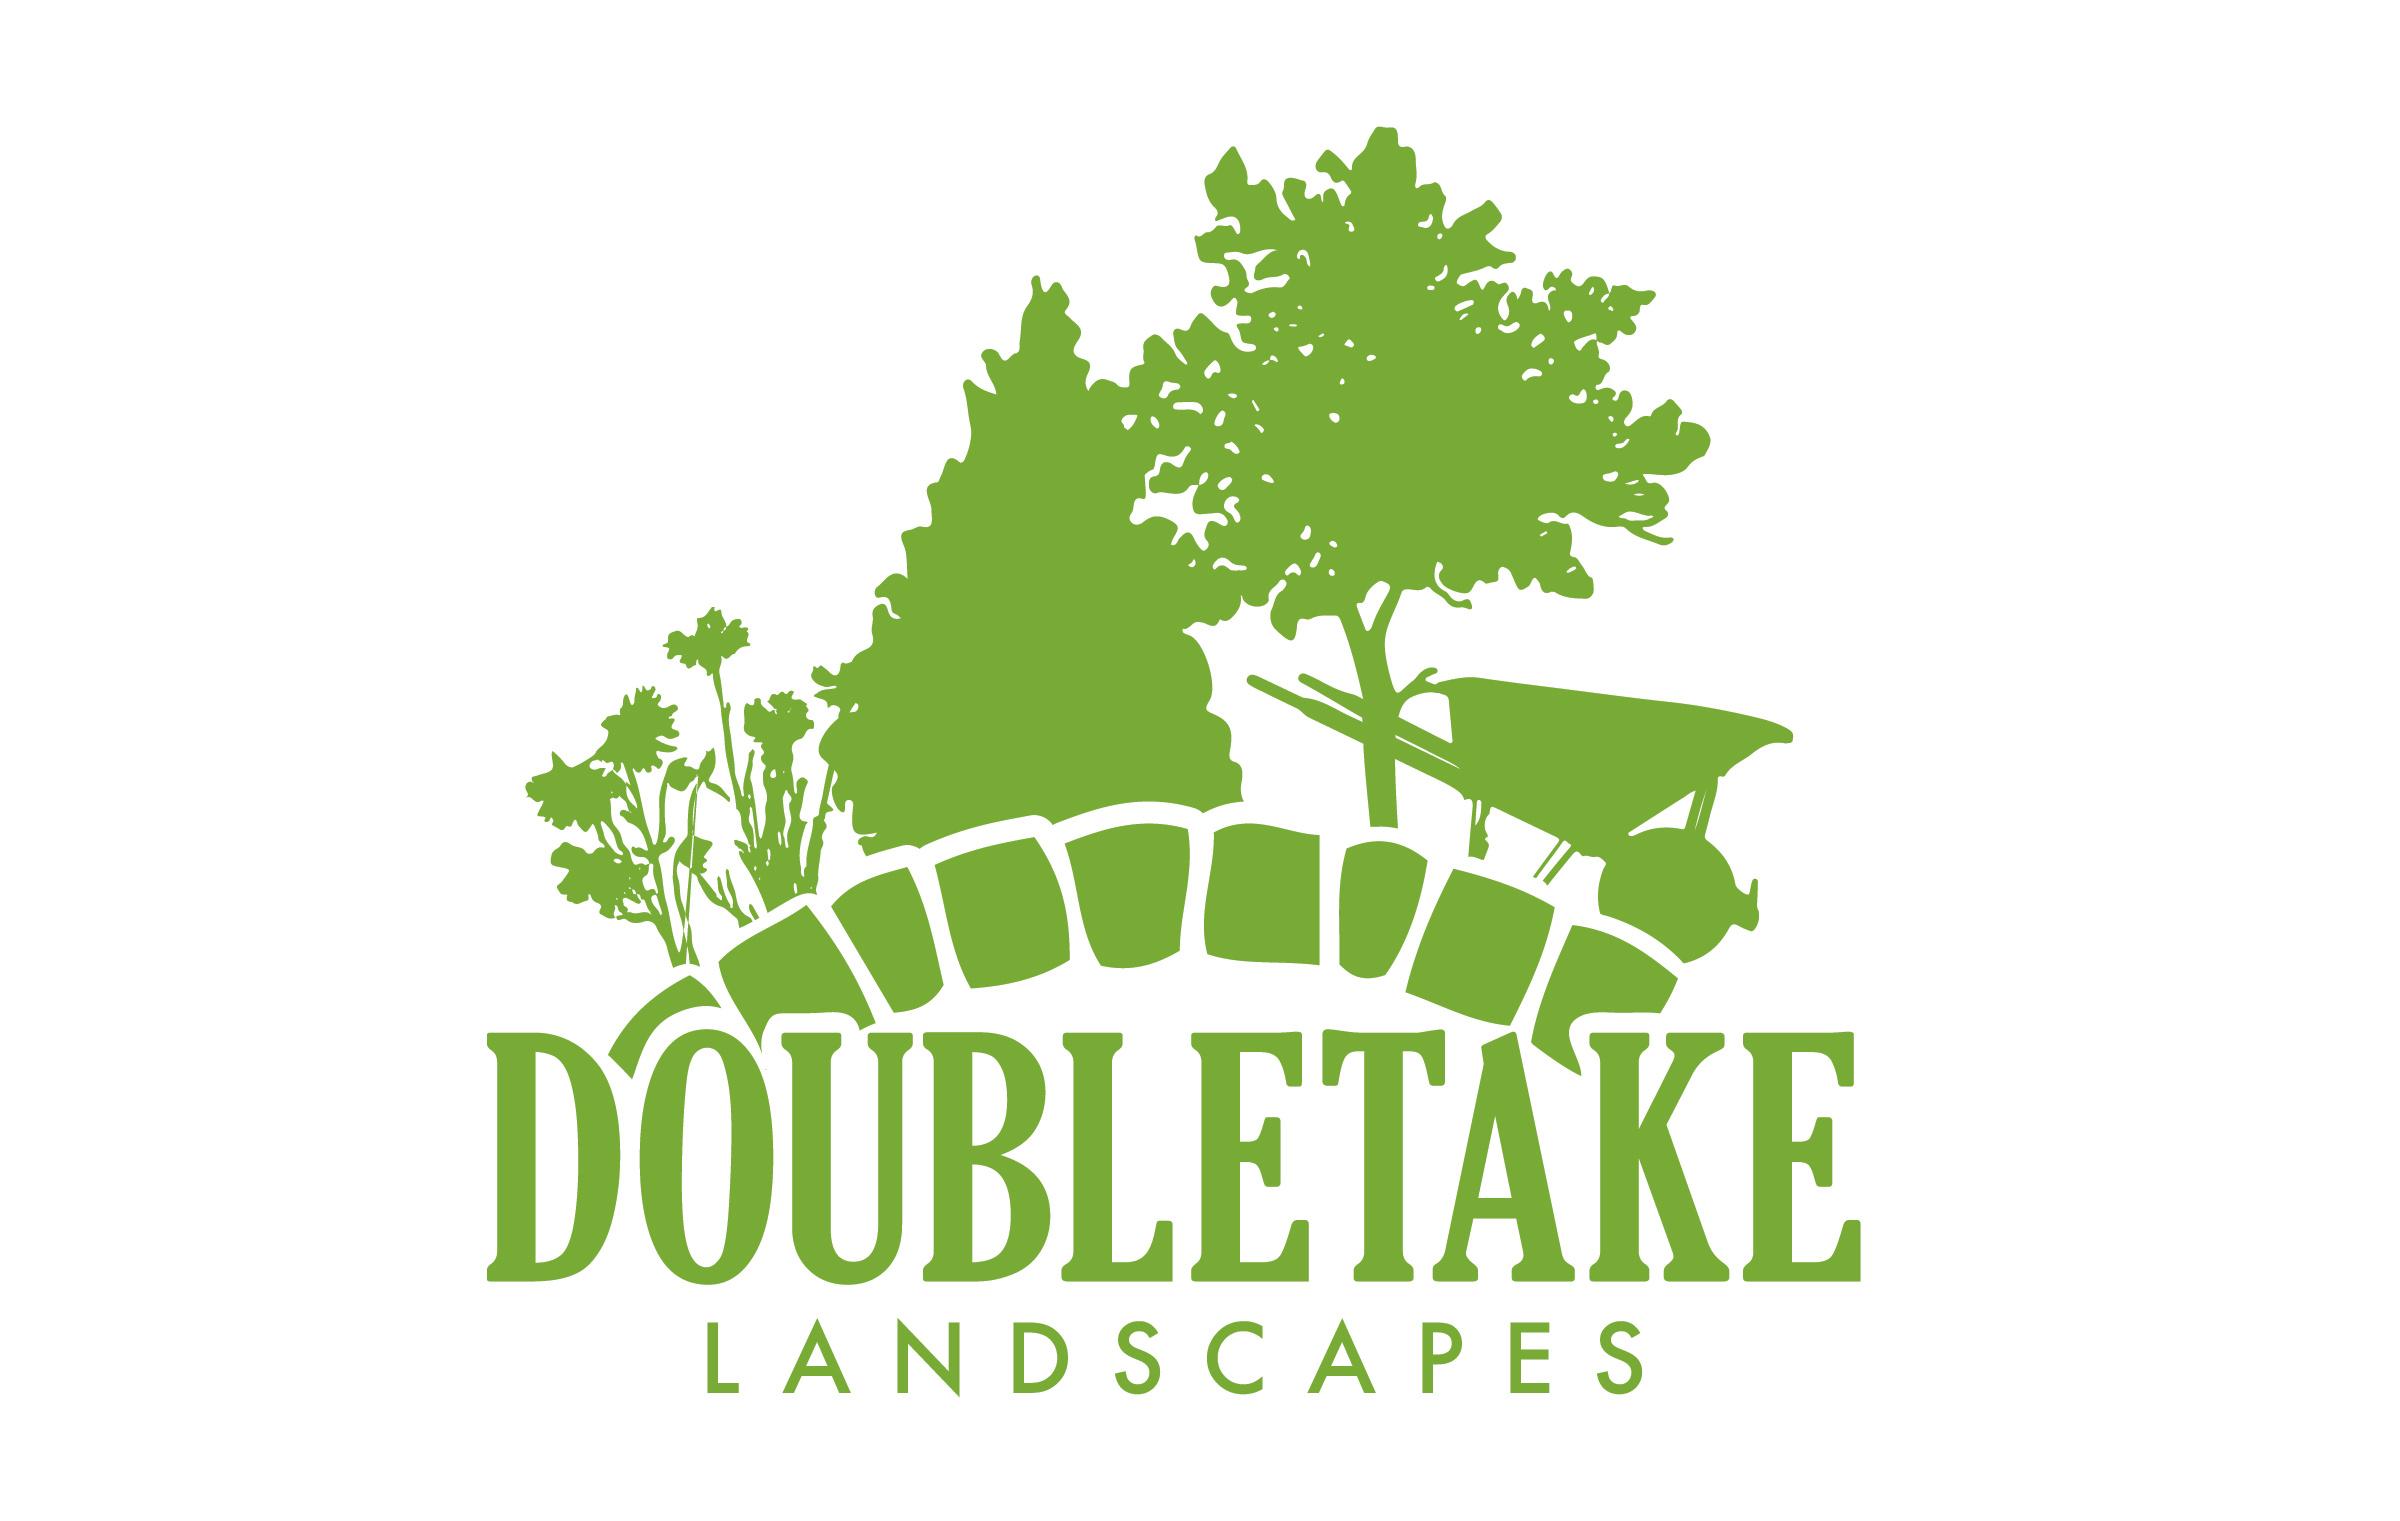 Dallas Doubletake Landscaping-01